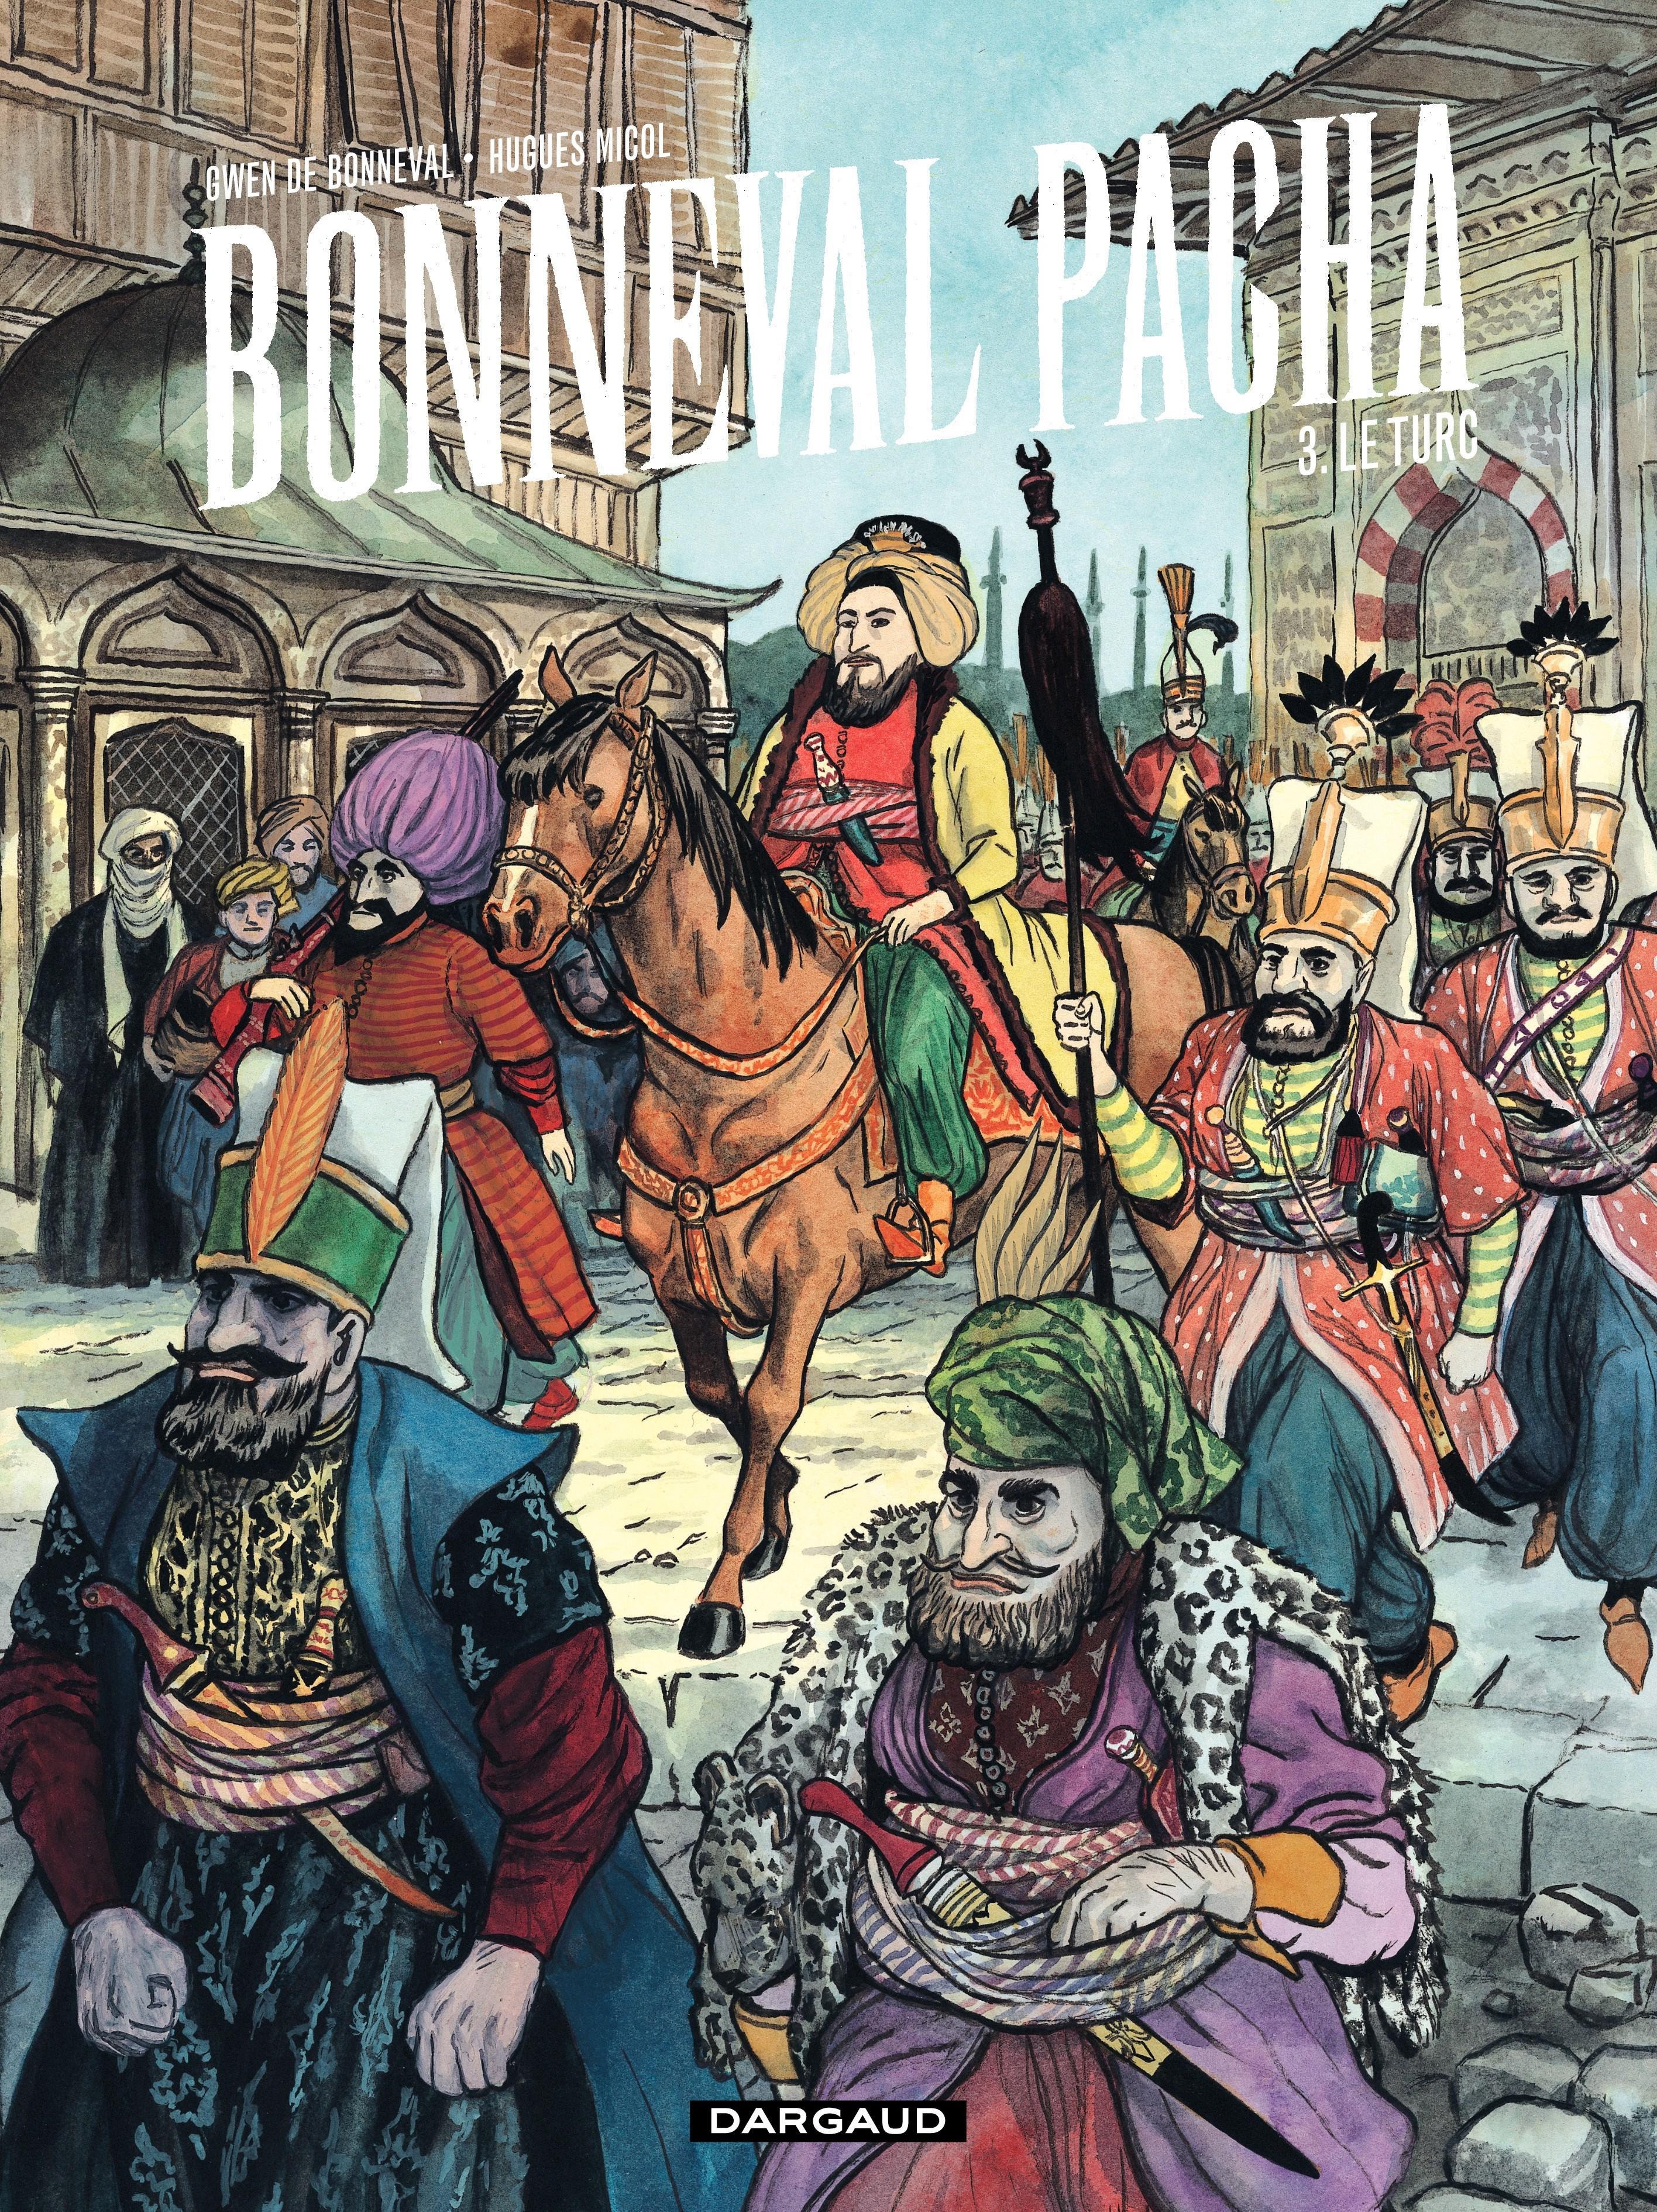 Bonneval Pacha - Tome 3 - le Turc